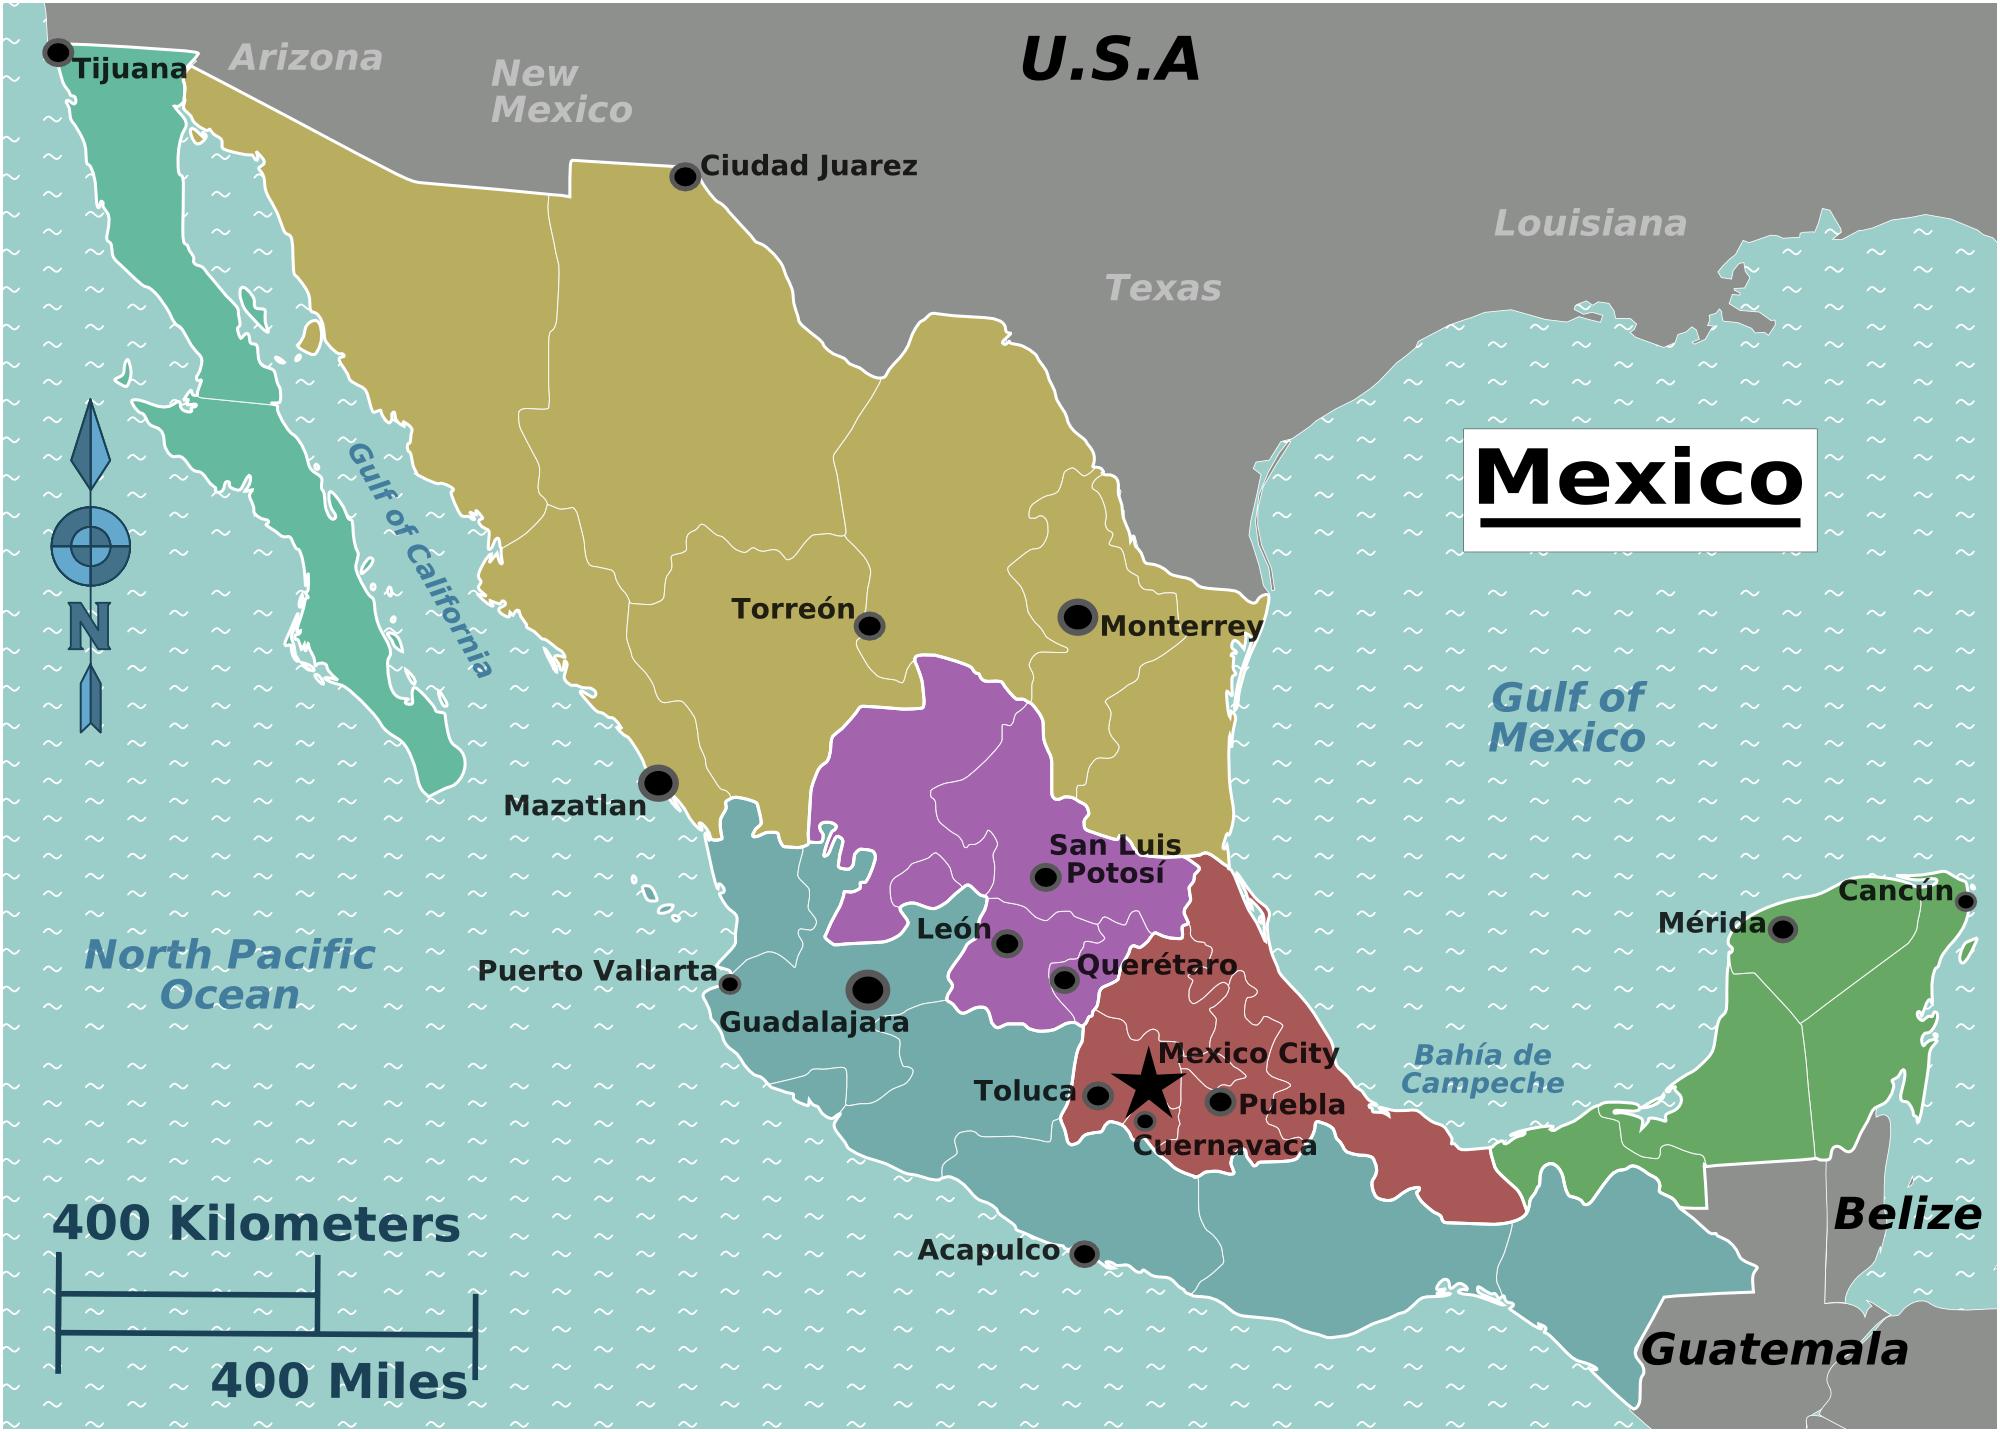 mexiko weltkarte Landkarte Mexiko (Überischtskarte) : Weltkarte.  Karten und  mexiko weltkarte